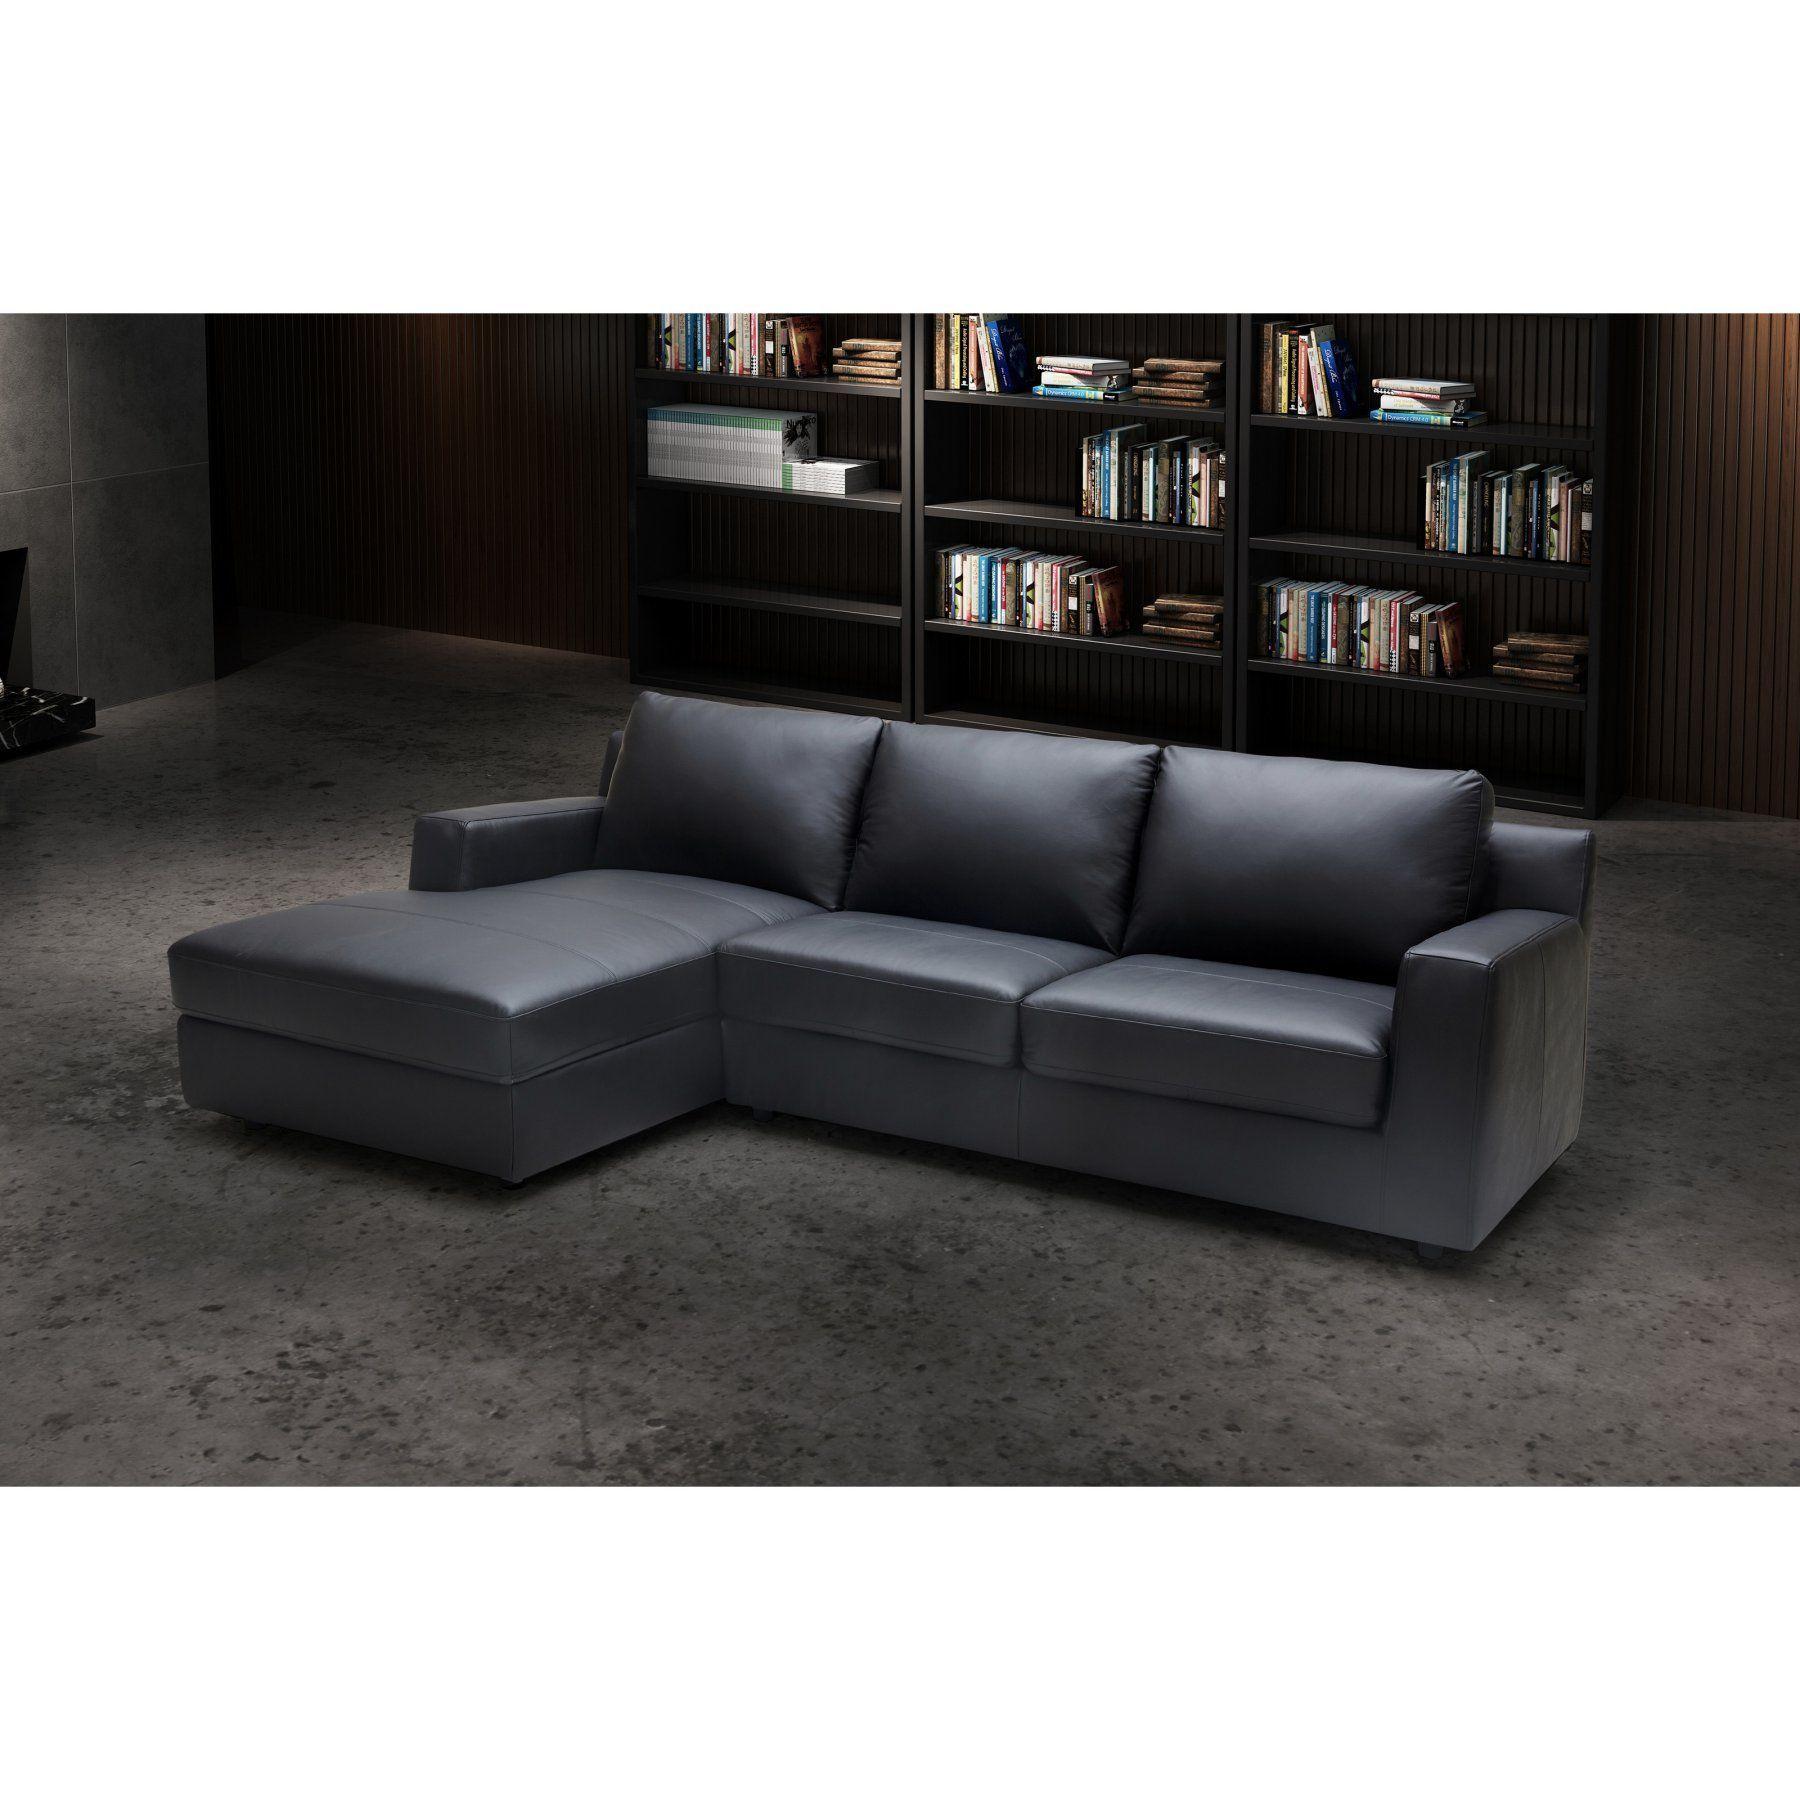 Paul schatz furniture portland or  JuM Furniture Elizabeth Chaise Sofa  LHFC  Chaise sofa and